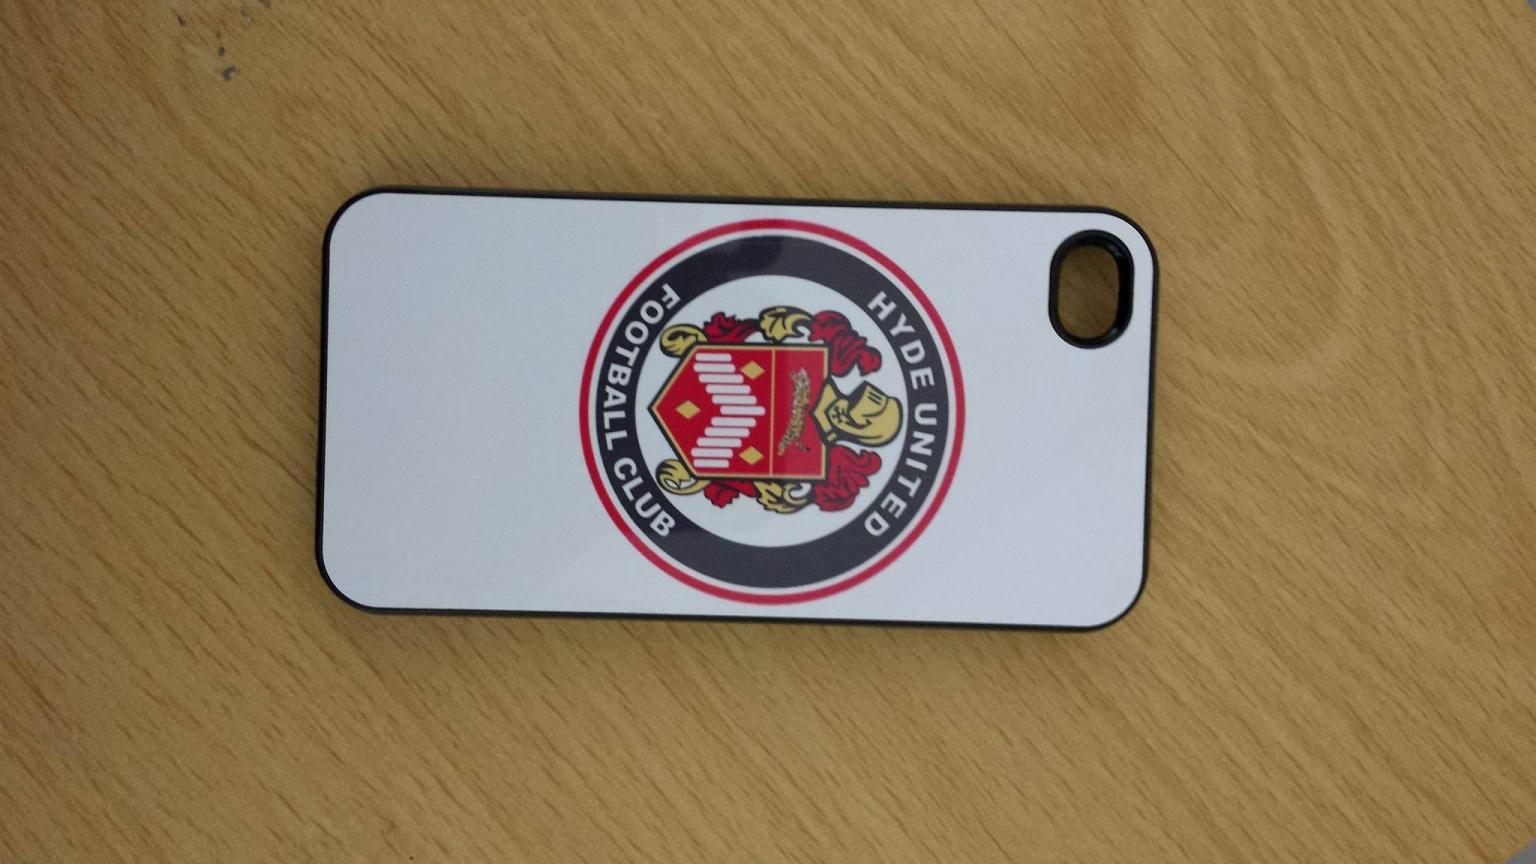 Image: iPhone 4 Case